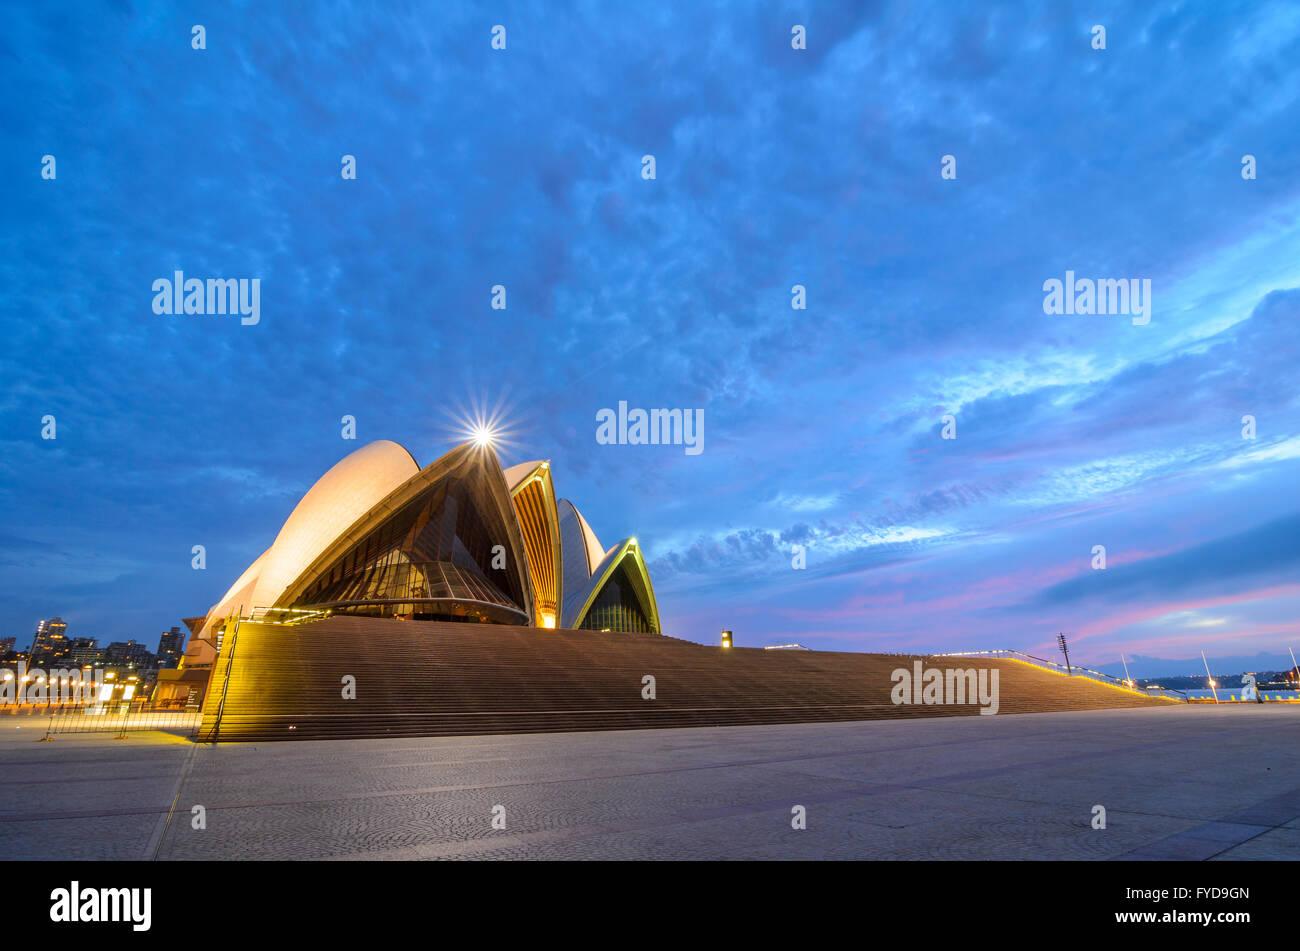 Amanecer en Sydney Opera House Imagen De Stock